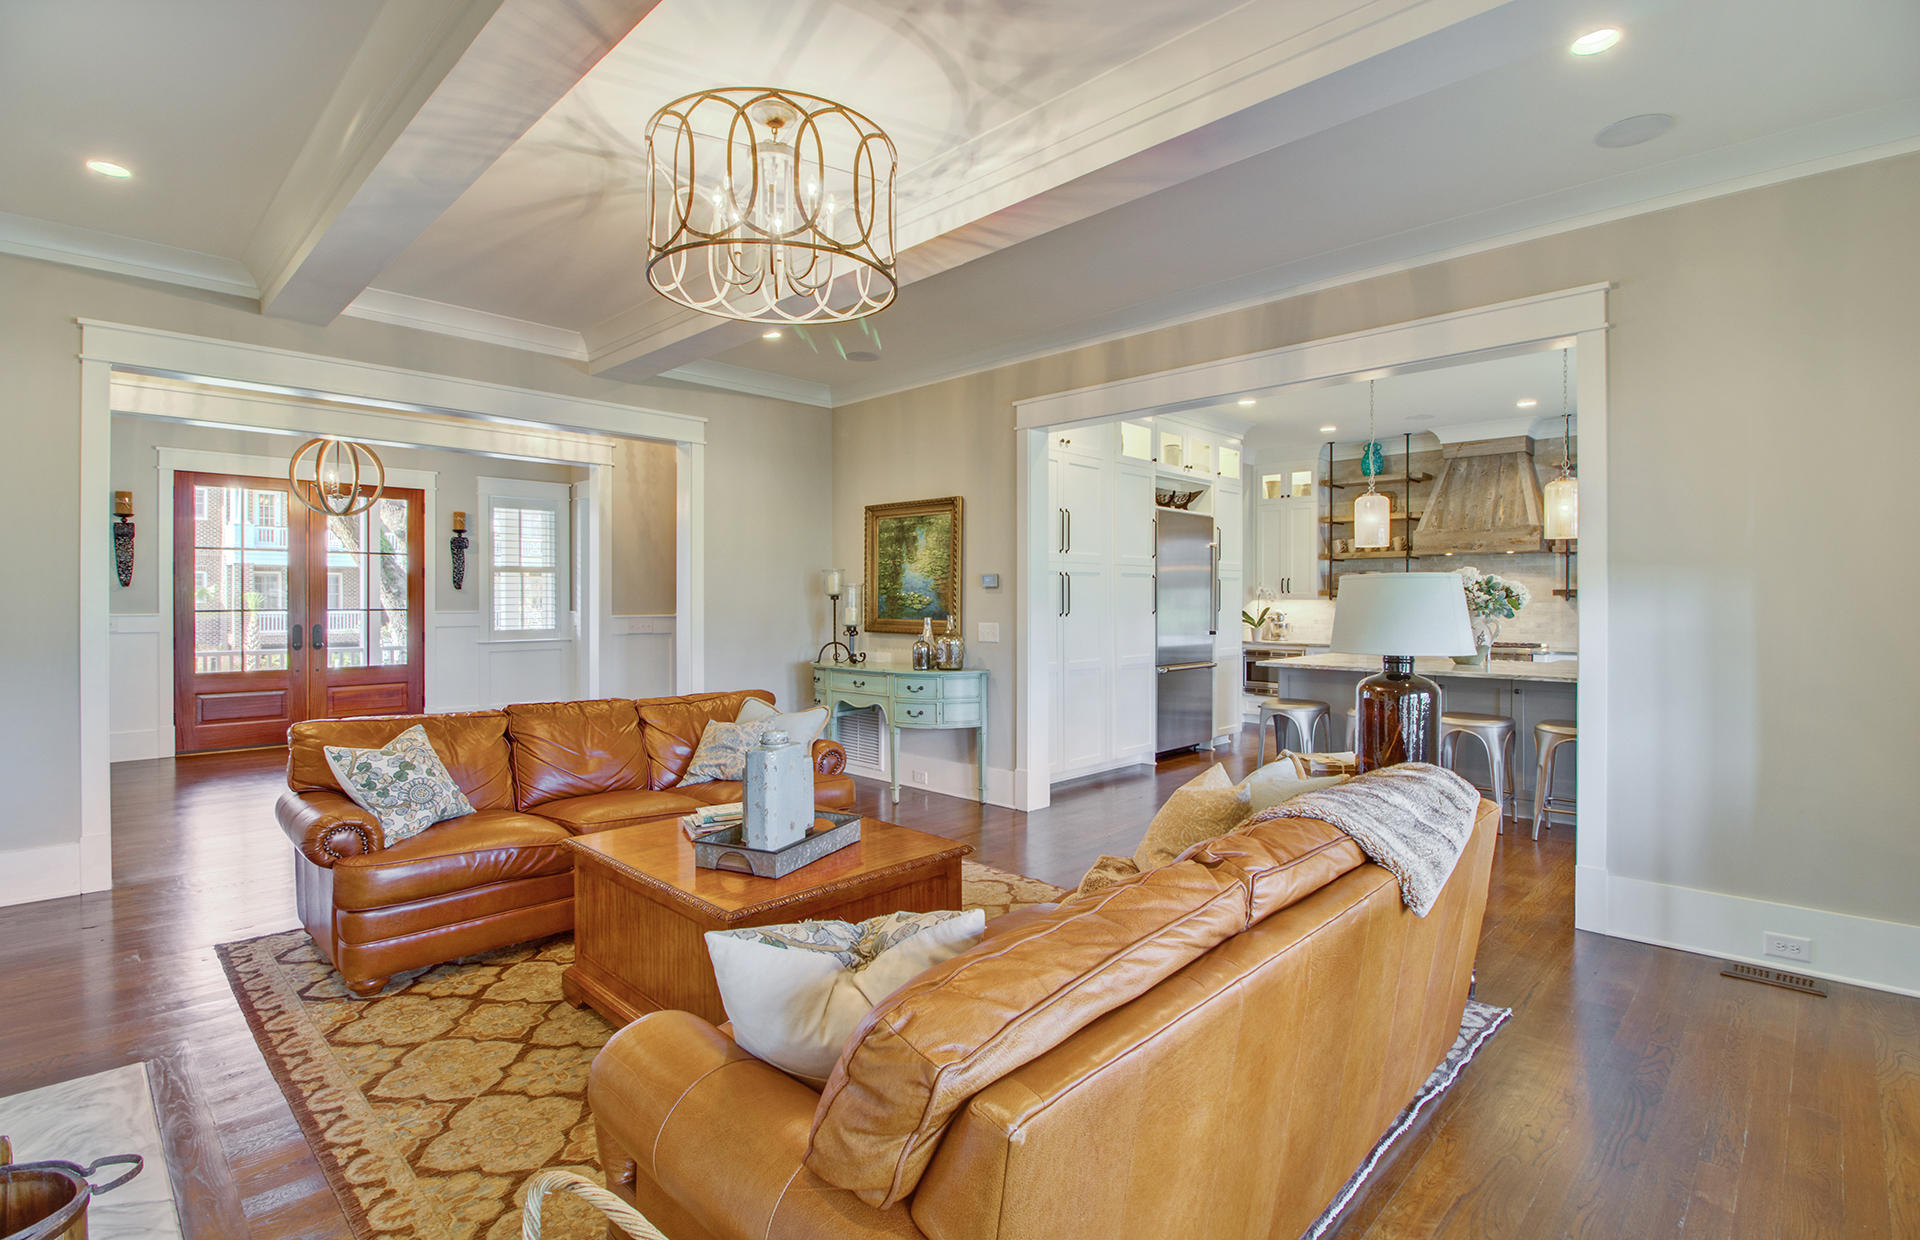 Daniel Island Park Homes For Sale - 117 Brailsford, Charleston, SC - 72